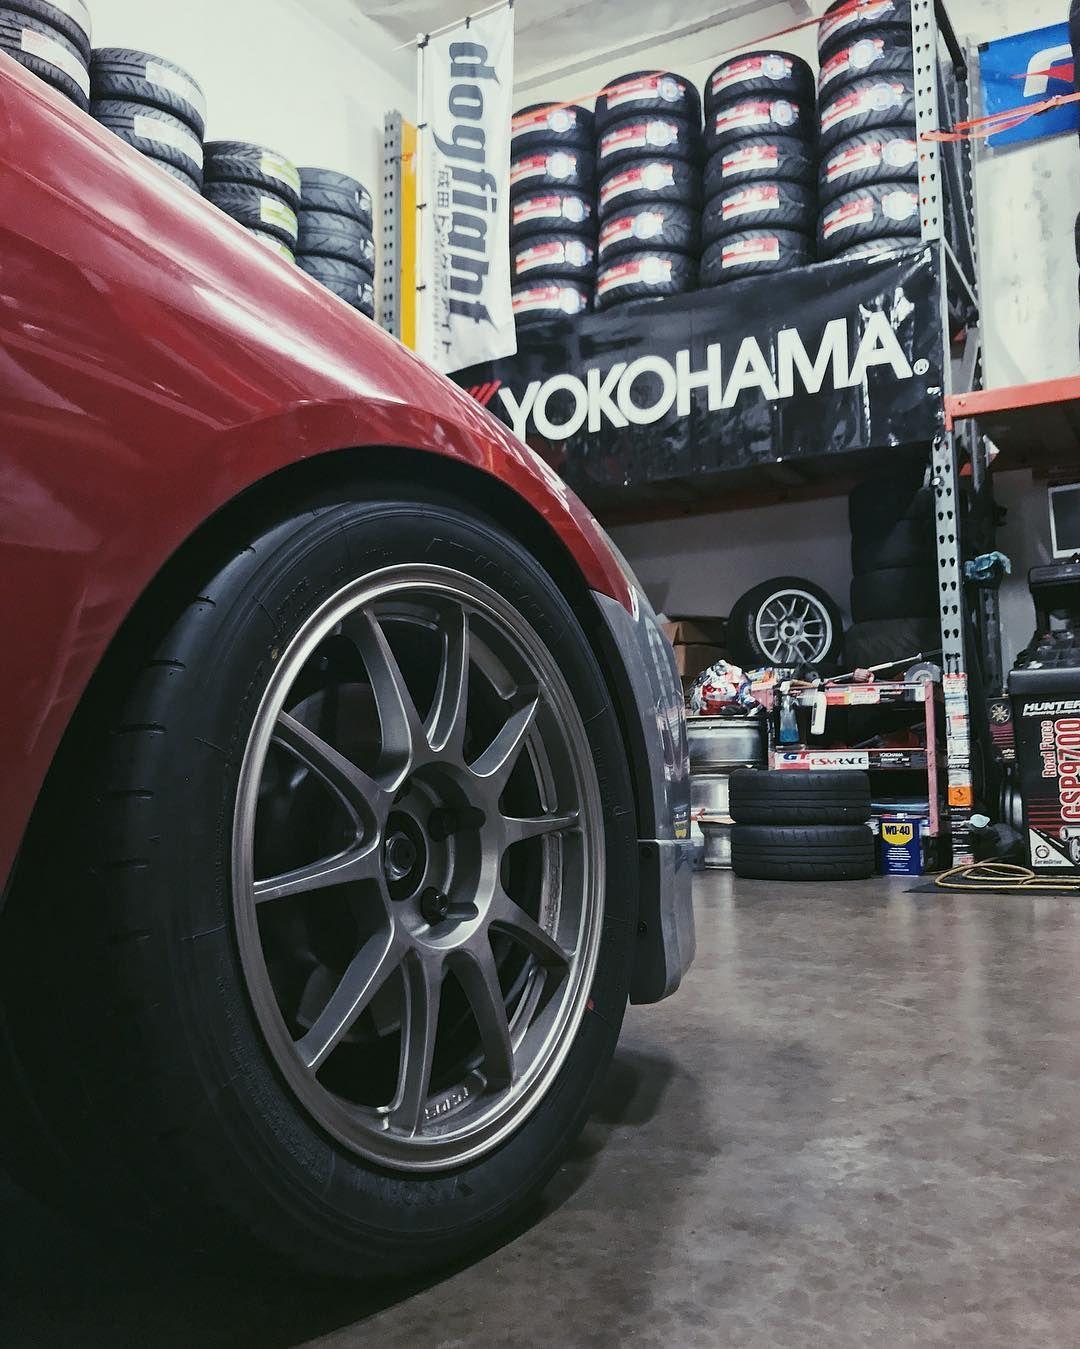 R Compound Rcompoundusa On Instagram Tonyjackson S Tsx Is Ready For Some Hotlaps This Weekend With New 255 40 17 Yokohama Advan A052 Tires Rcompoundusa [ 1349 x 1080 Pixel ]